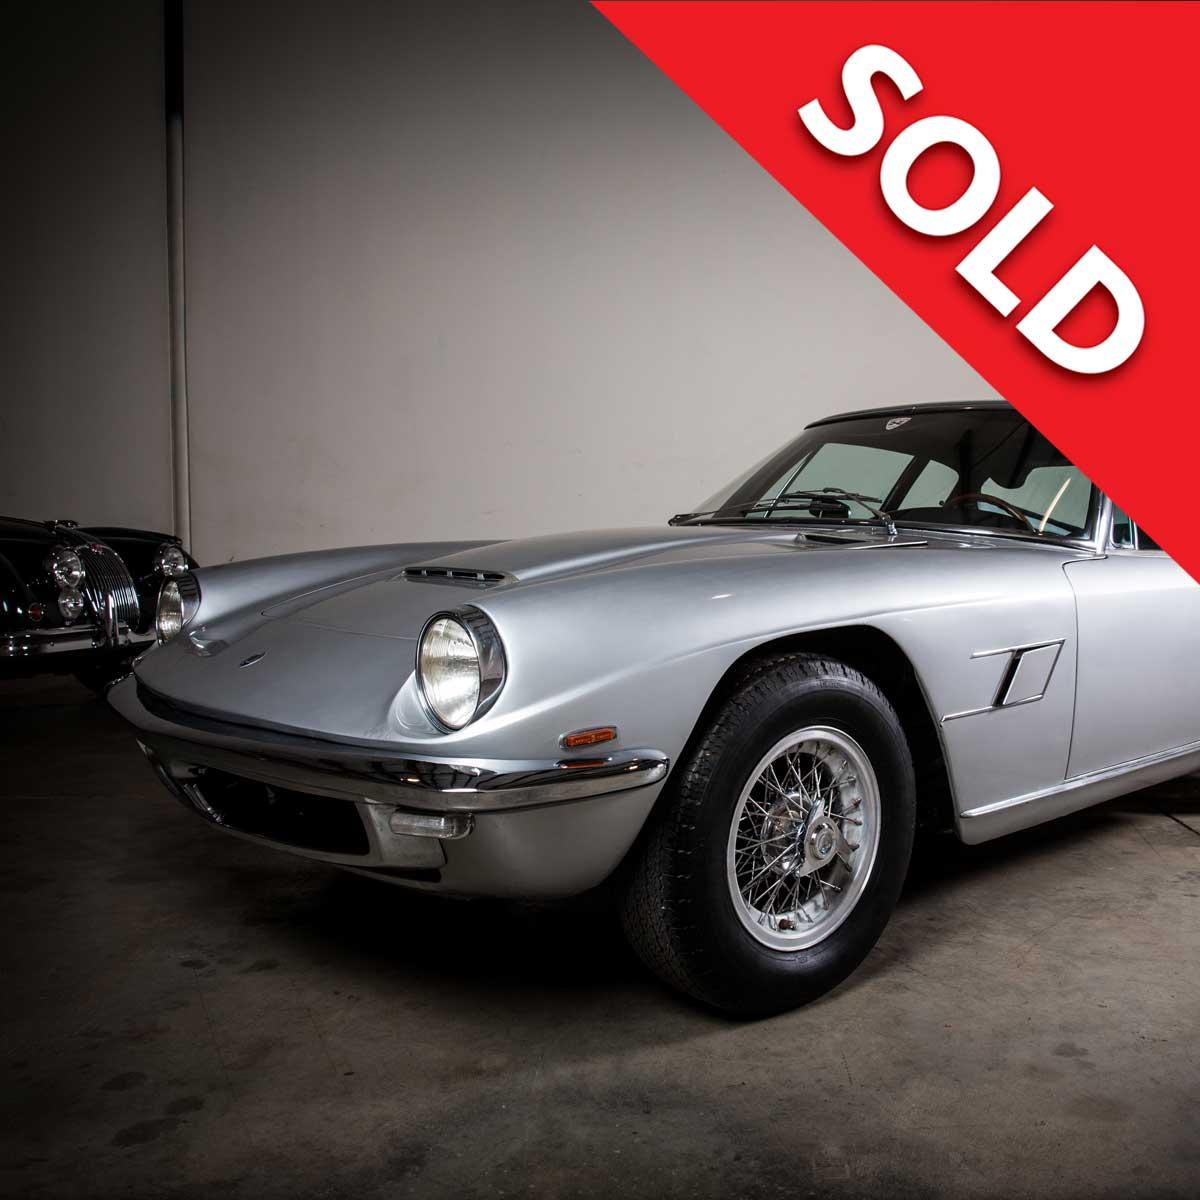 Sold – 1966 Maserati Mistral